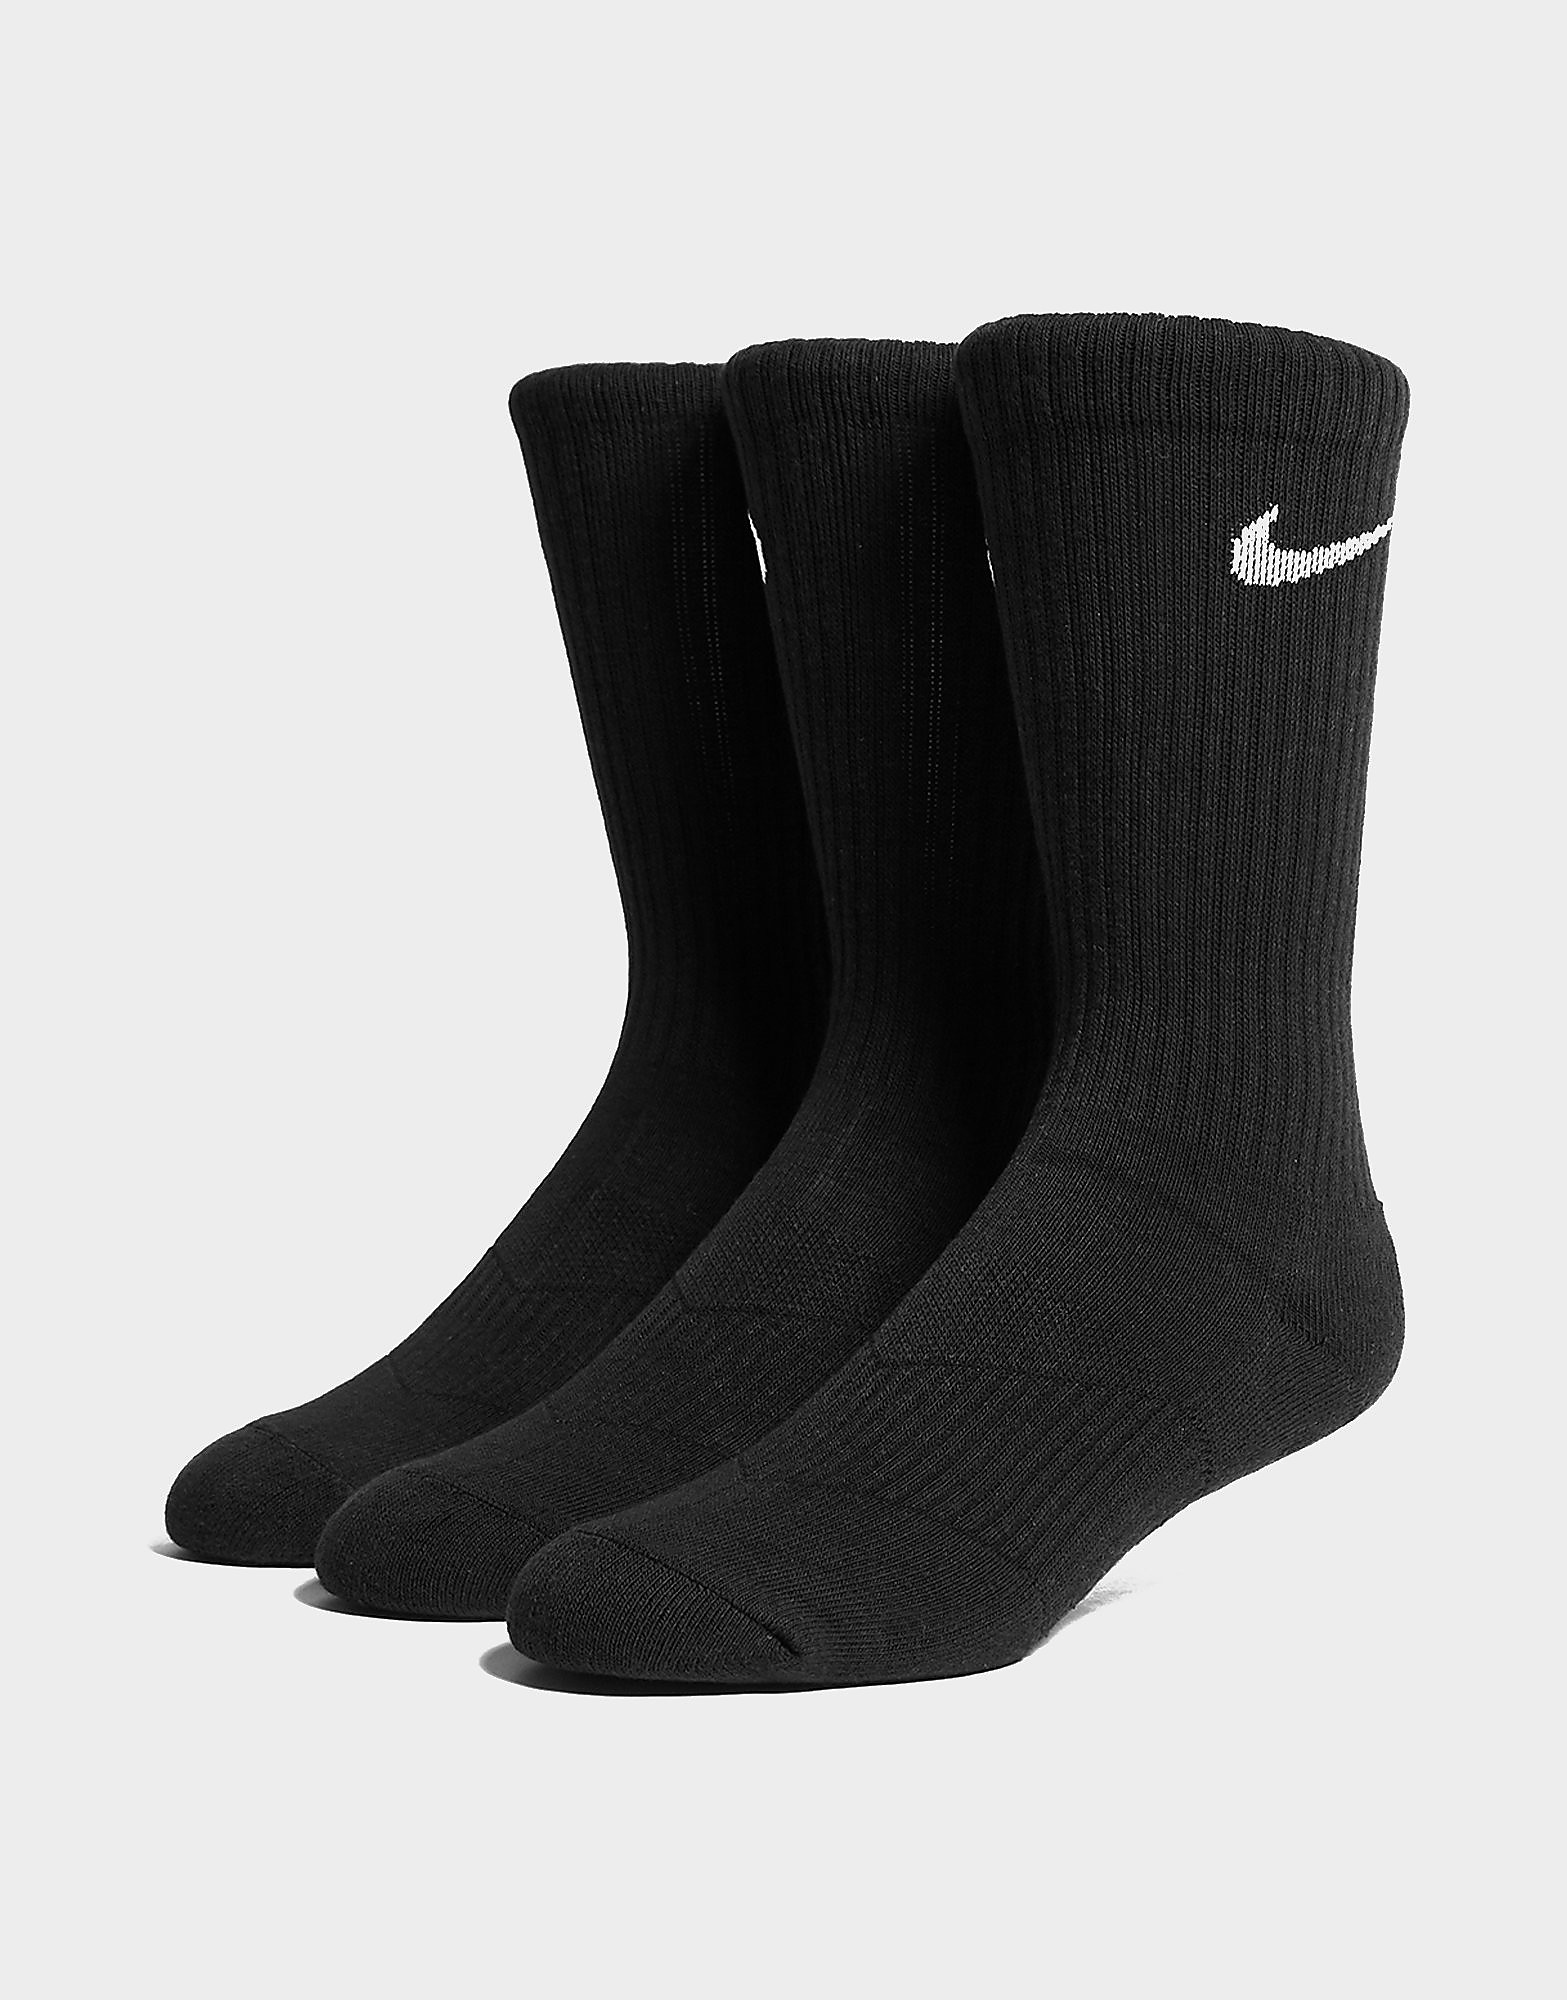 Nike Pak met 3 paar Basic Cuff-sokken